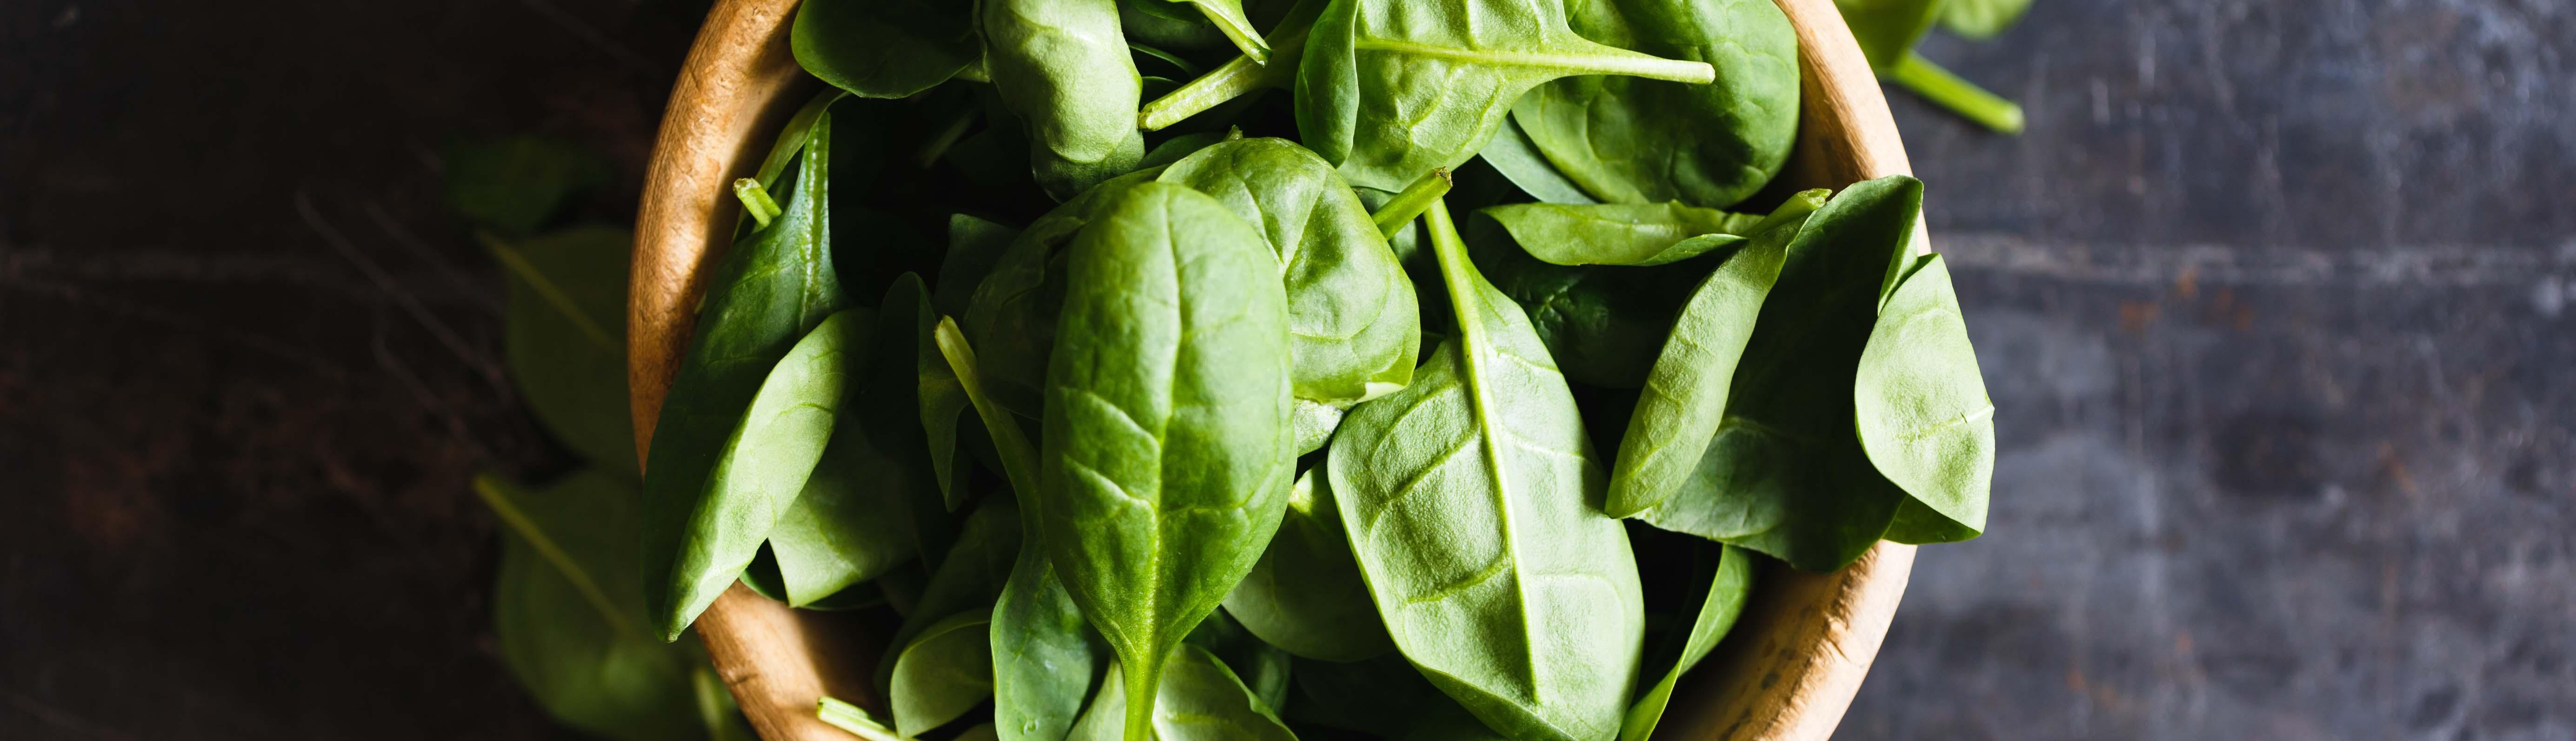 5 Leafy Greens that get Forgotten   Juicers UK